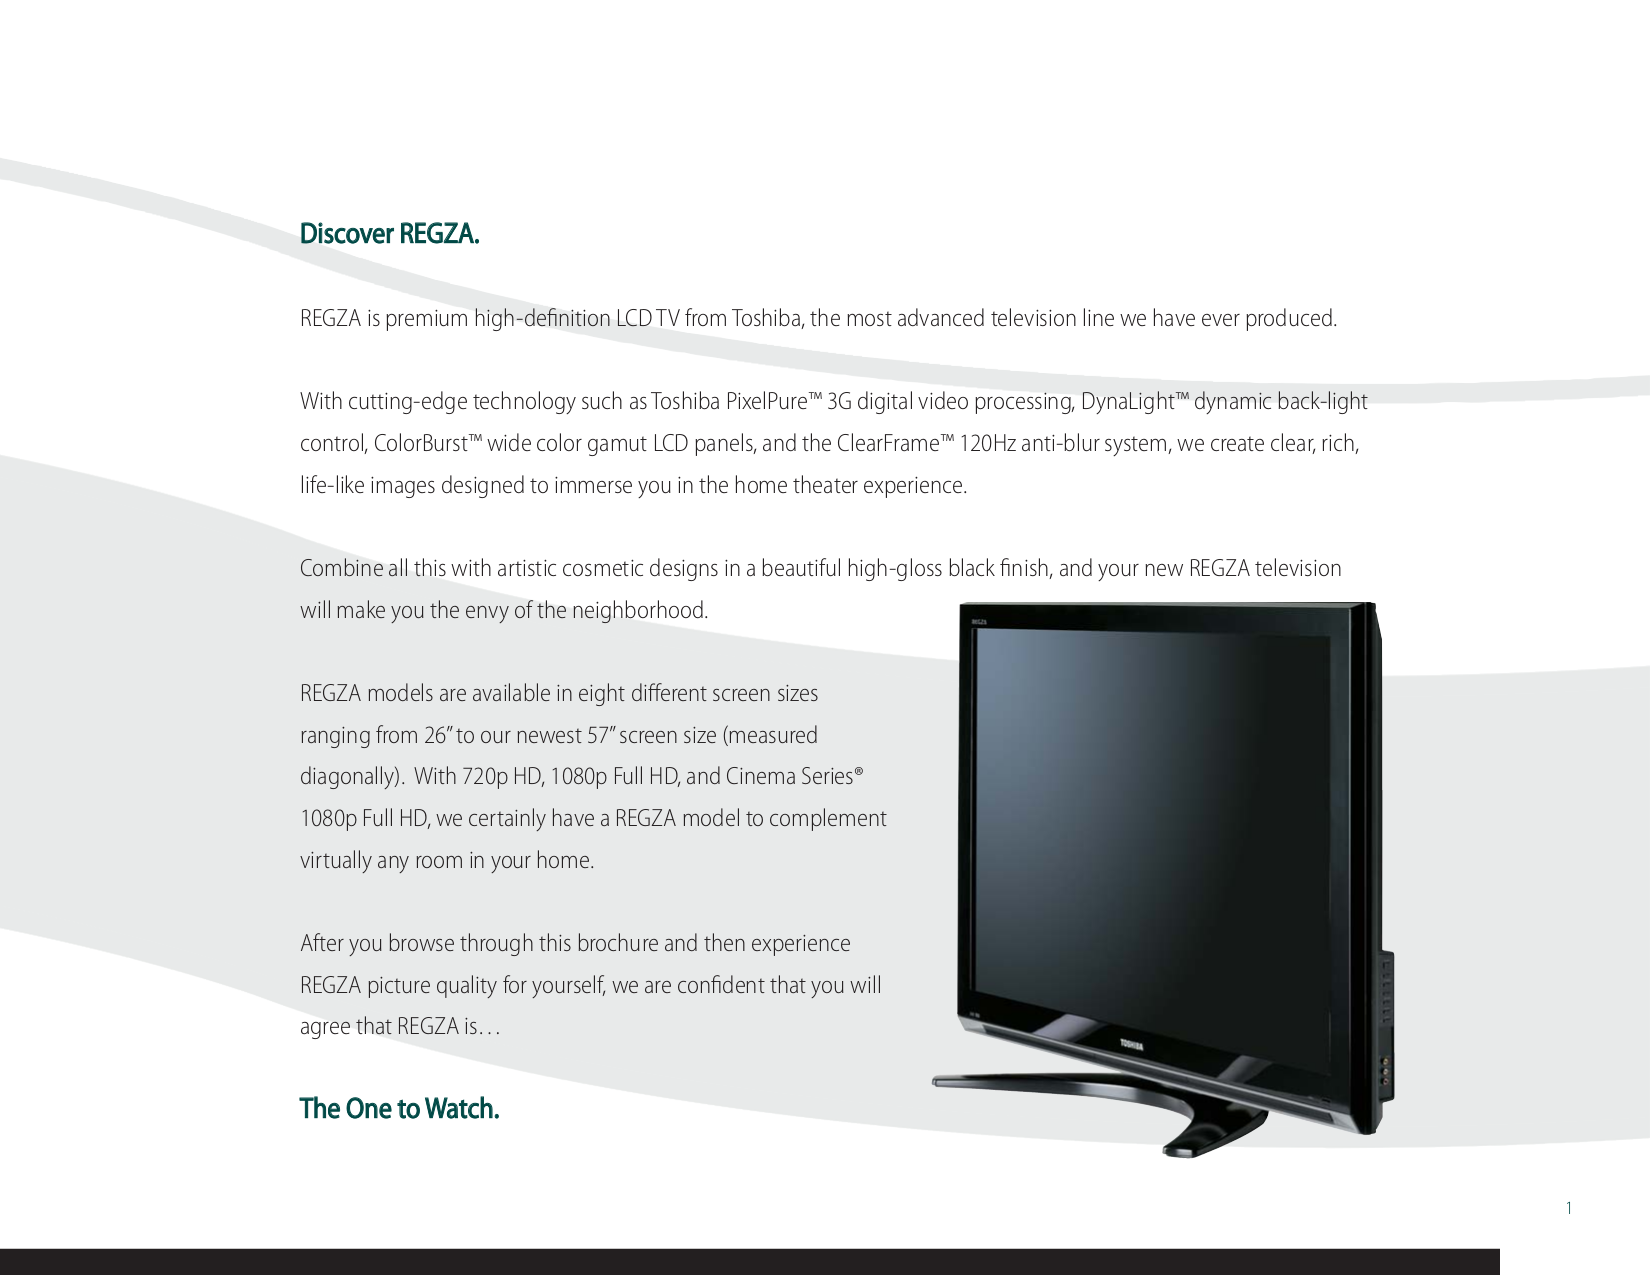 pdf manual for toshiba tv regza 42lx177 rh umlib com Toshiba Cinema Series Manual Toshiba LCD REGZA Manual